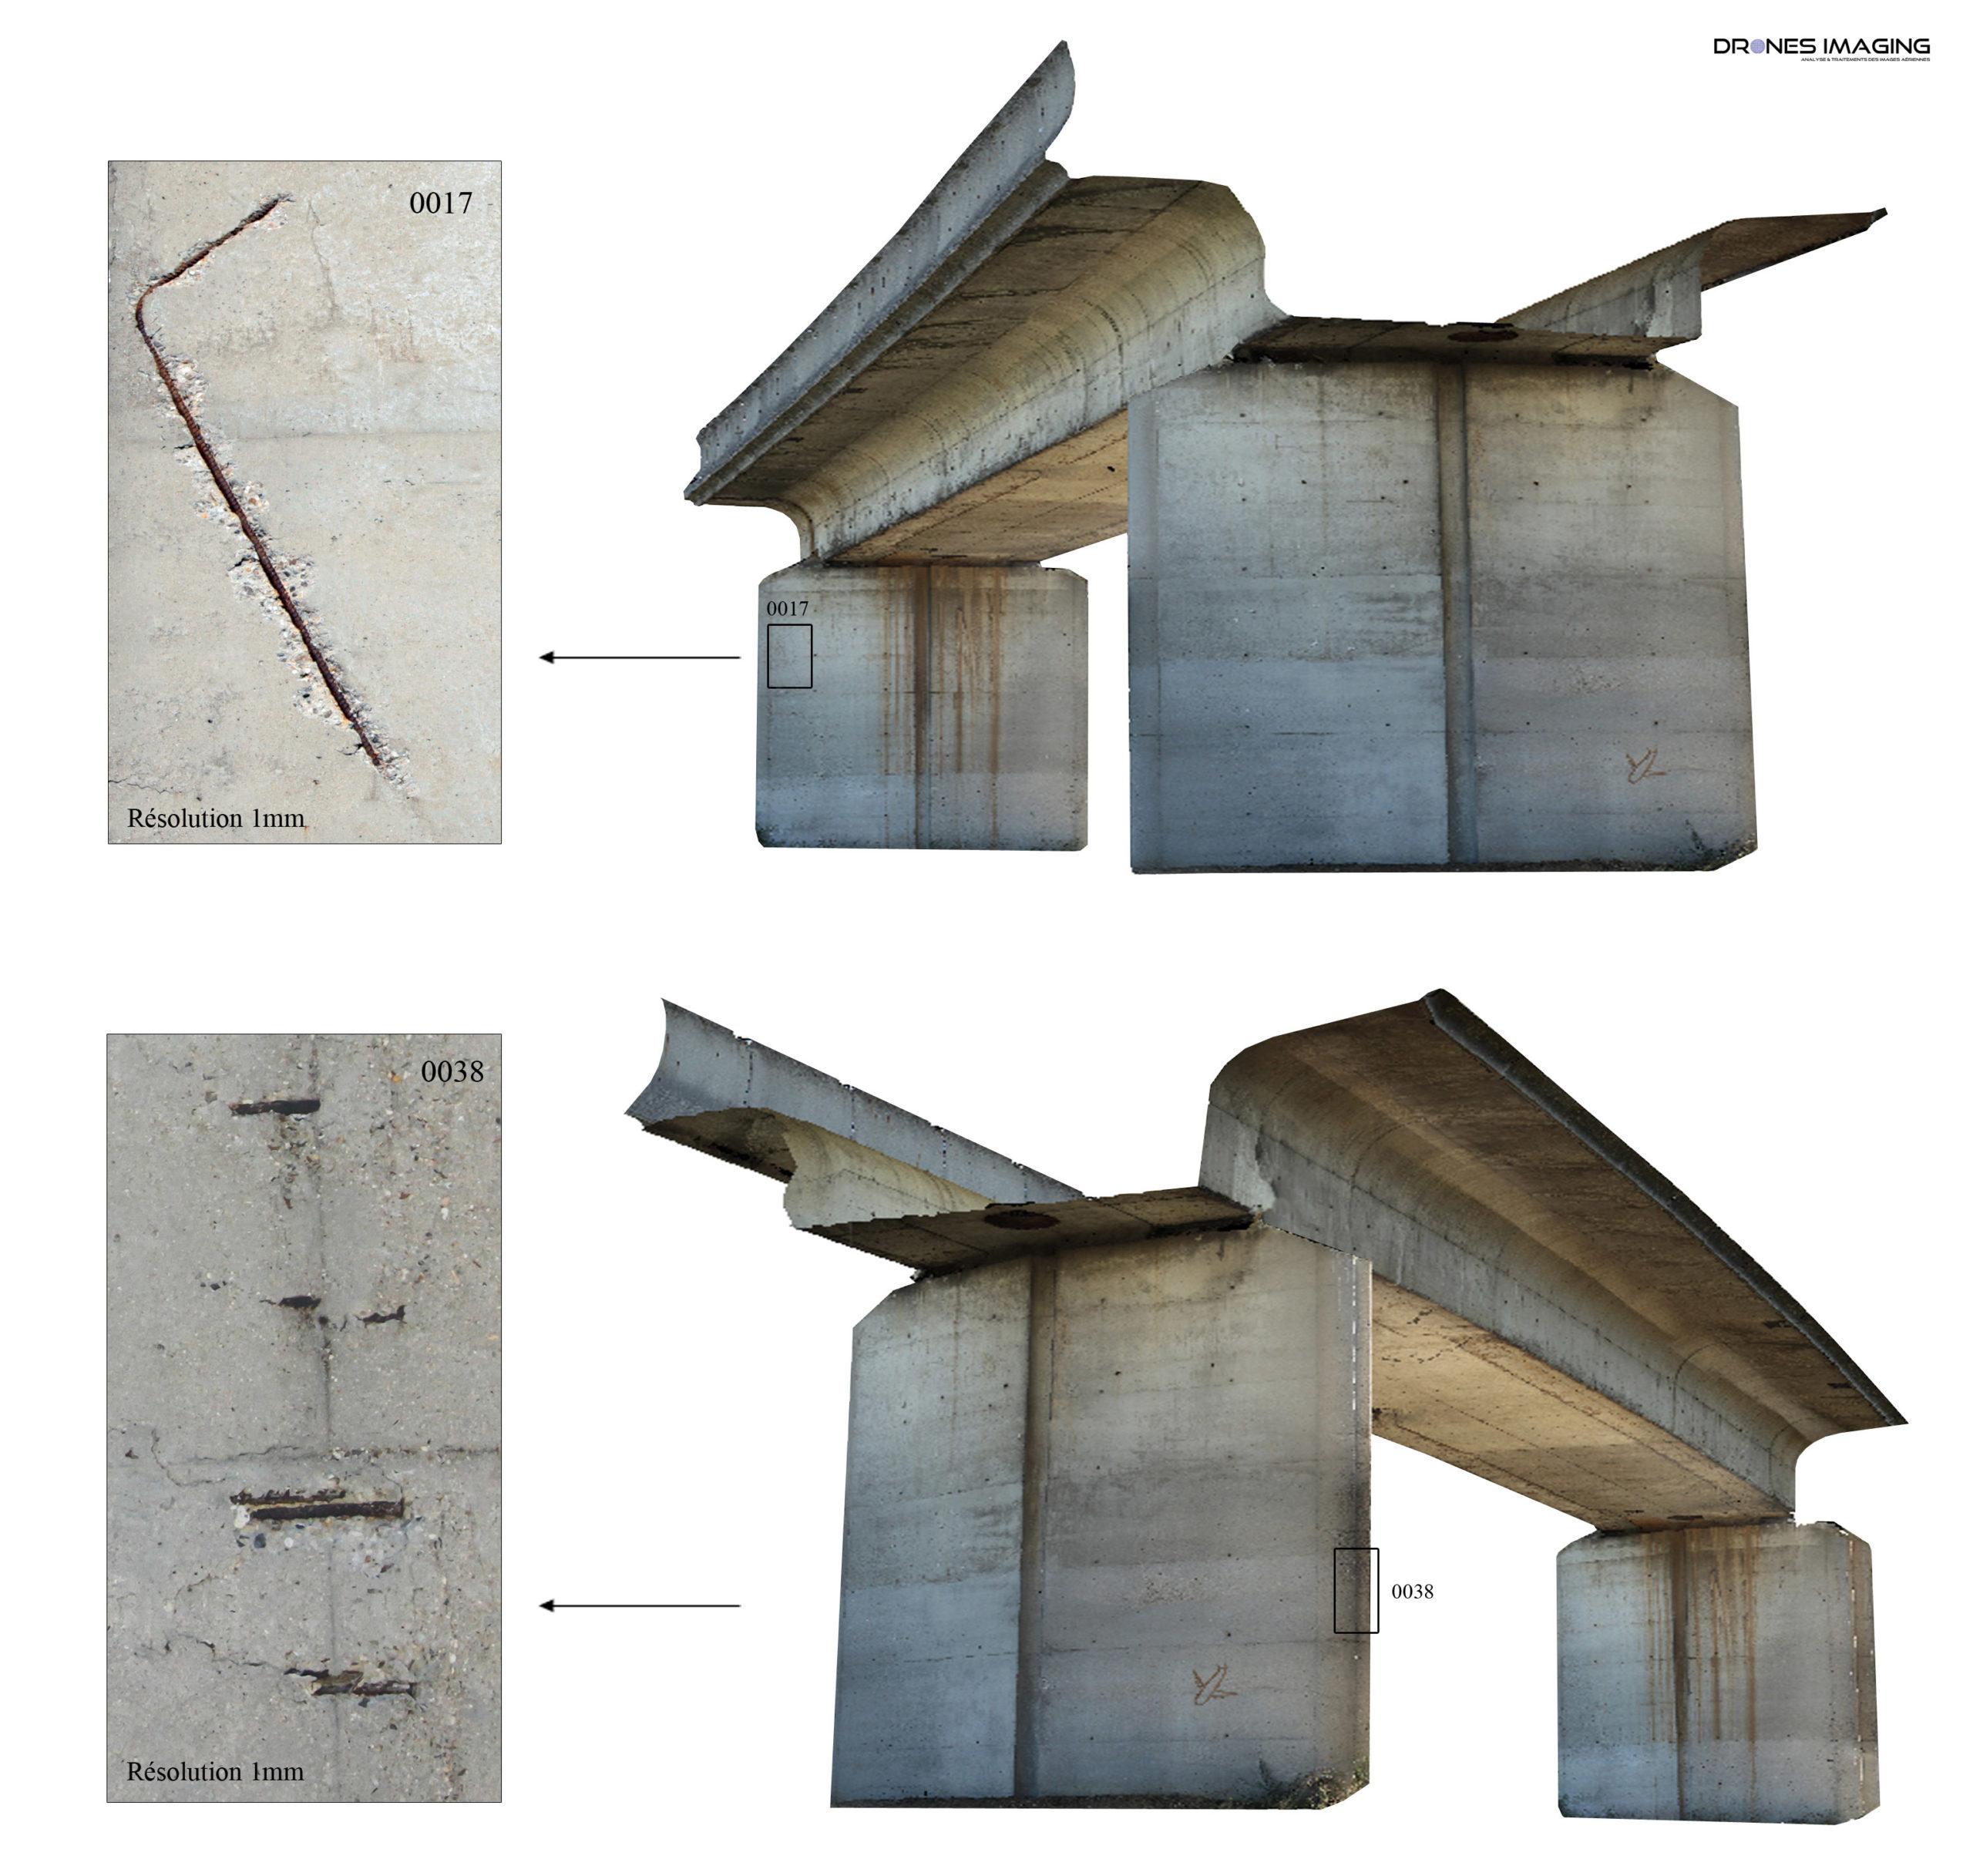 inspection_pont_dronesimaging